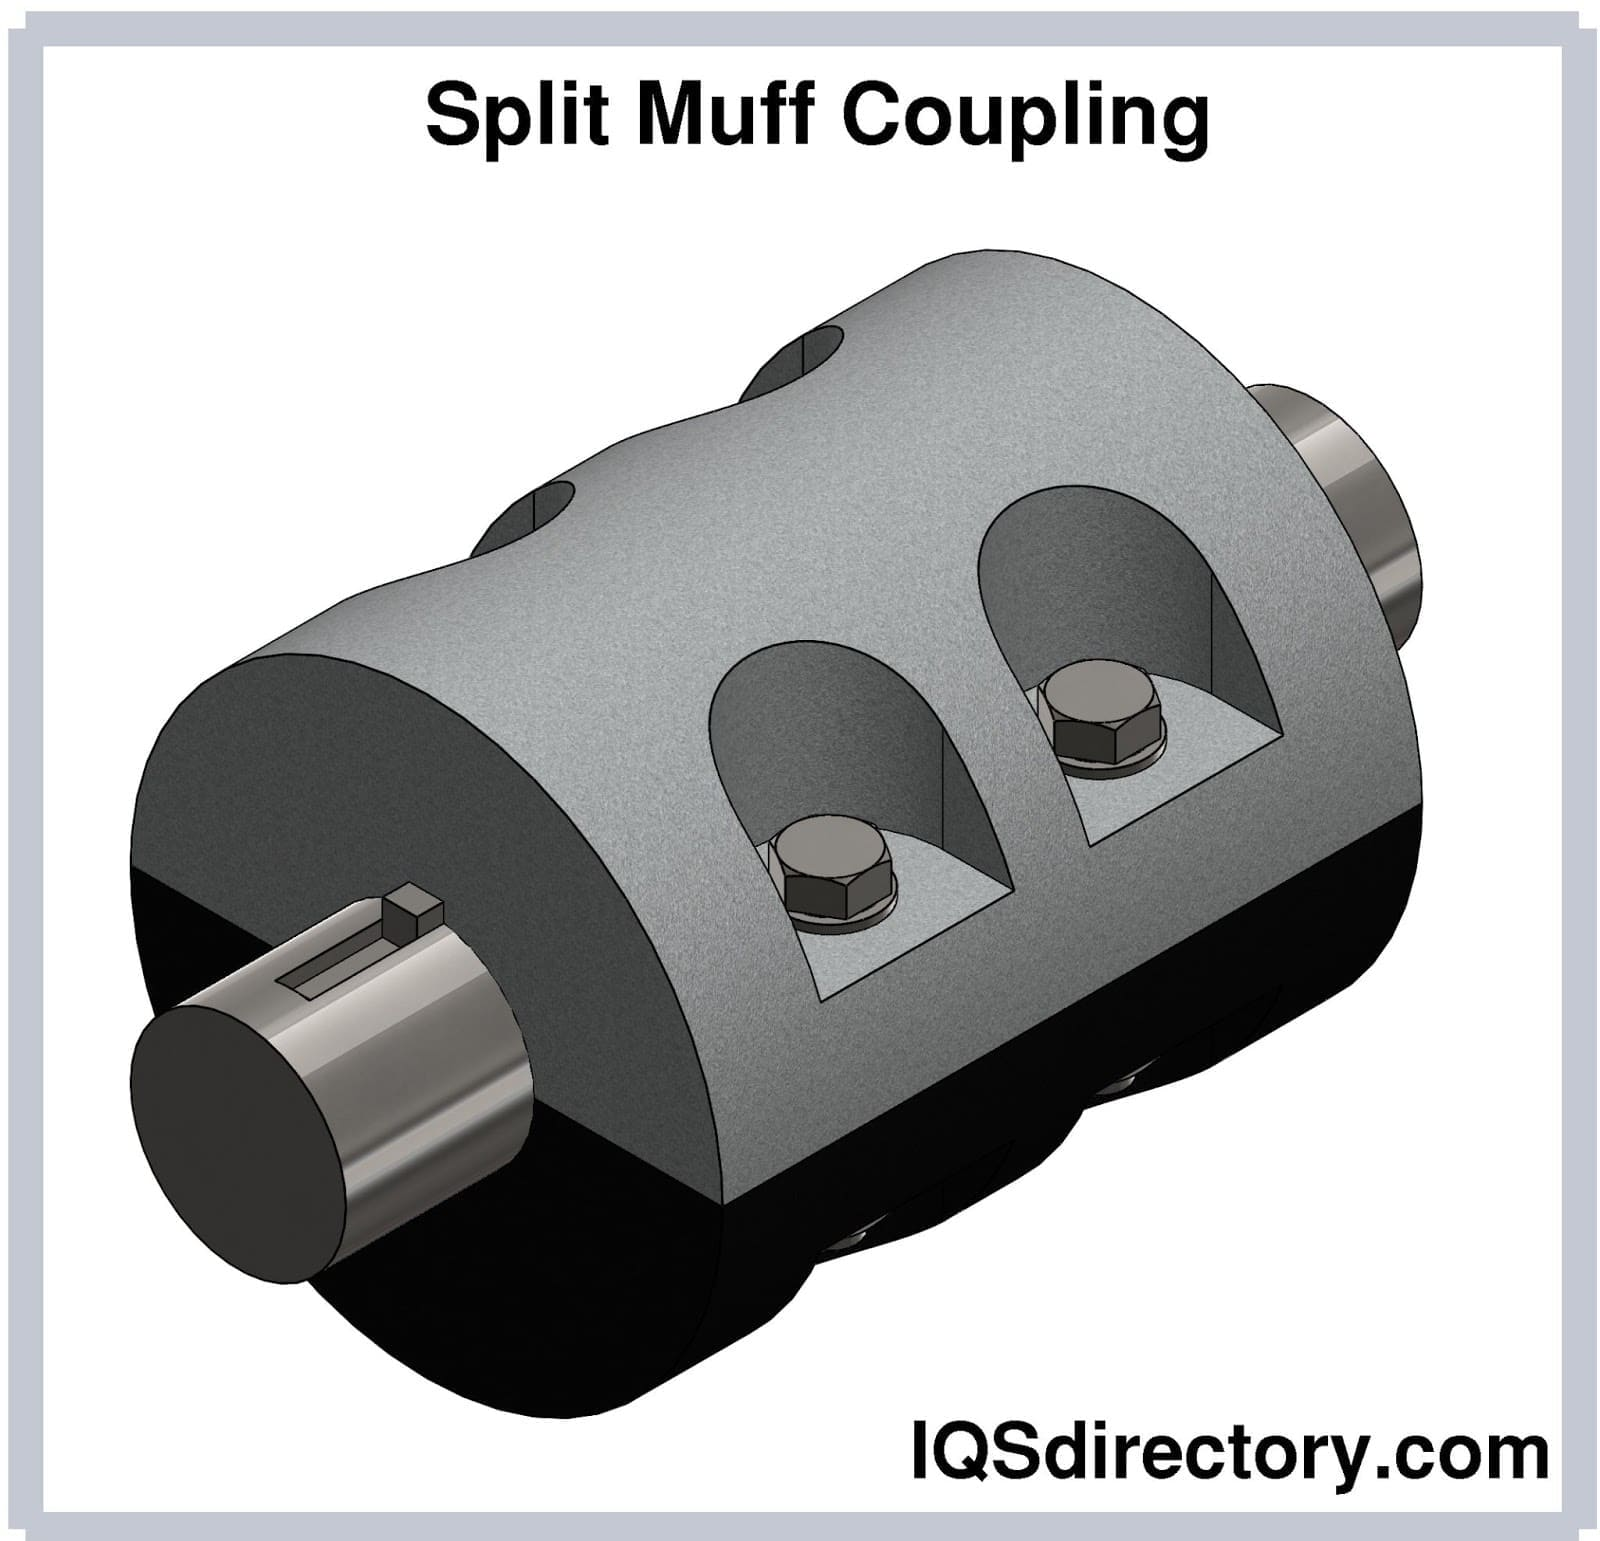 Split Muff Coupling